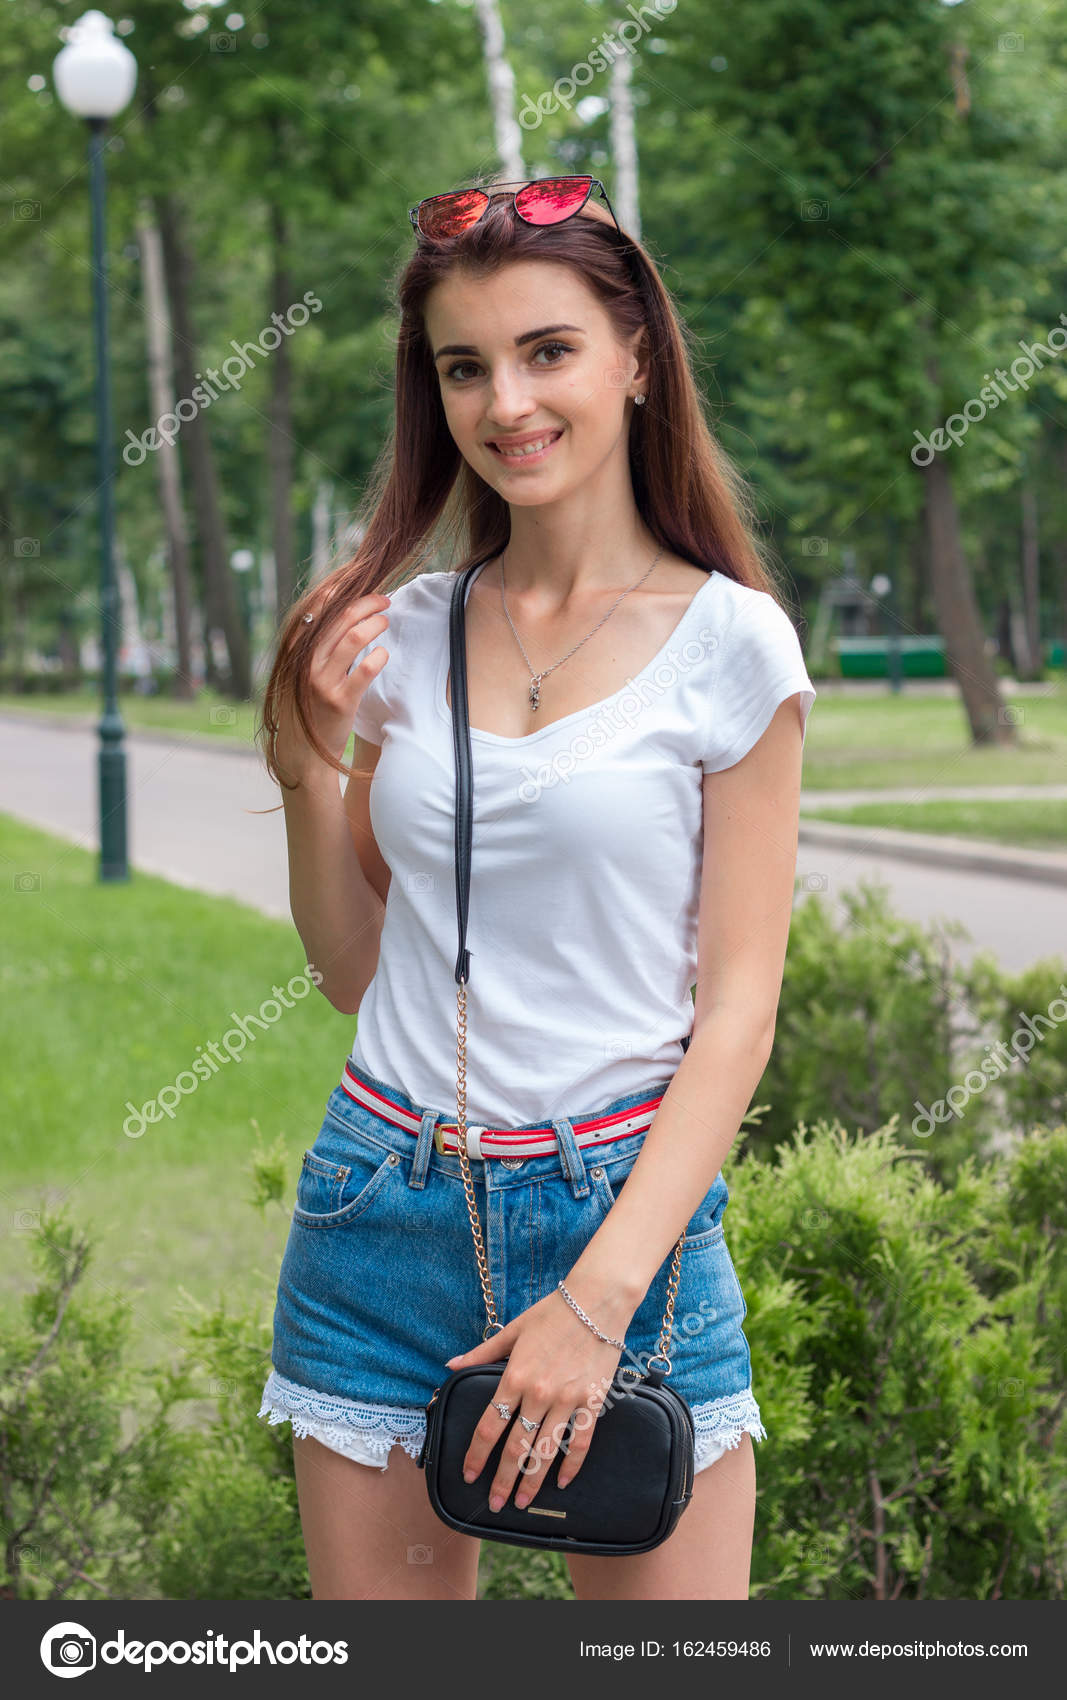 Muchachas Bonitas En Short Sonrisa Linda Chica En Shorts